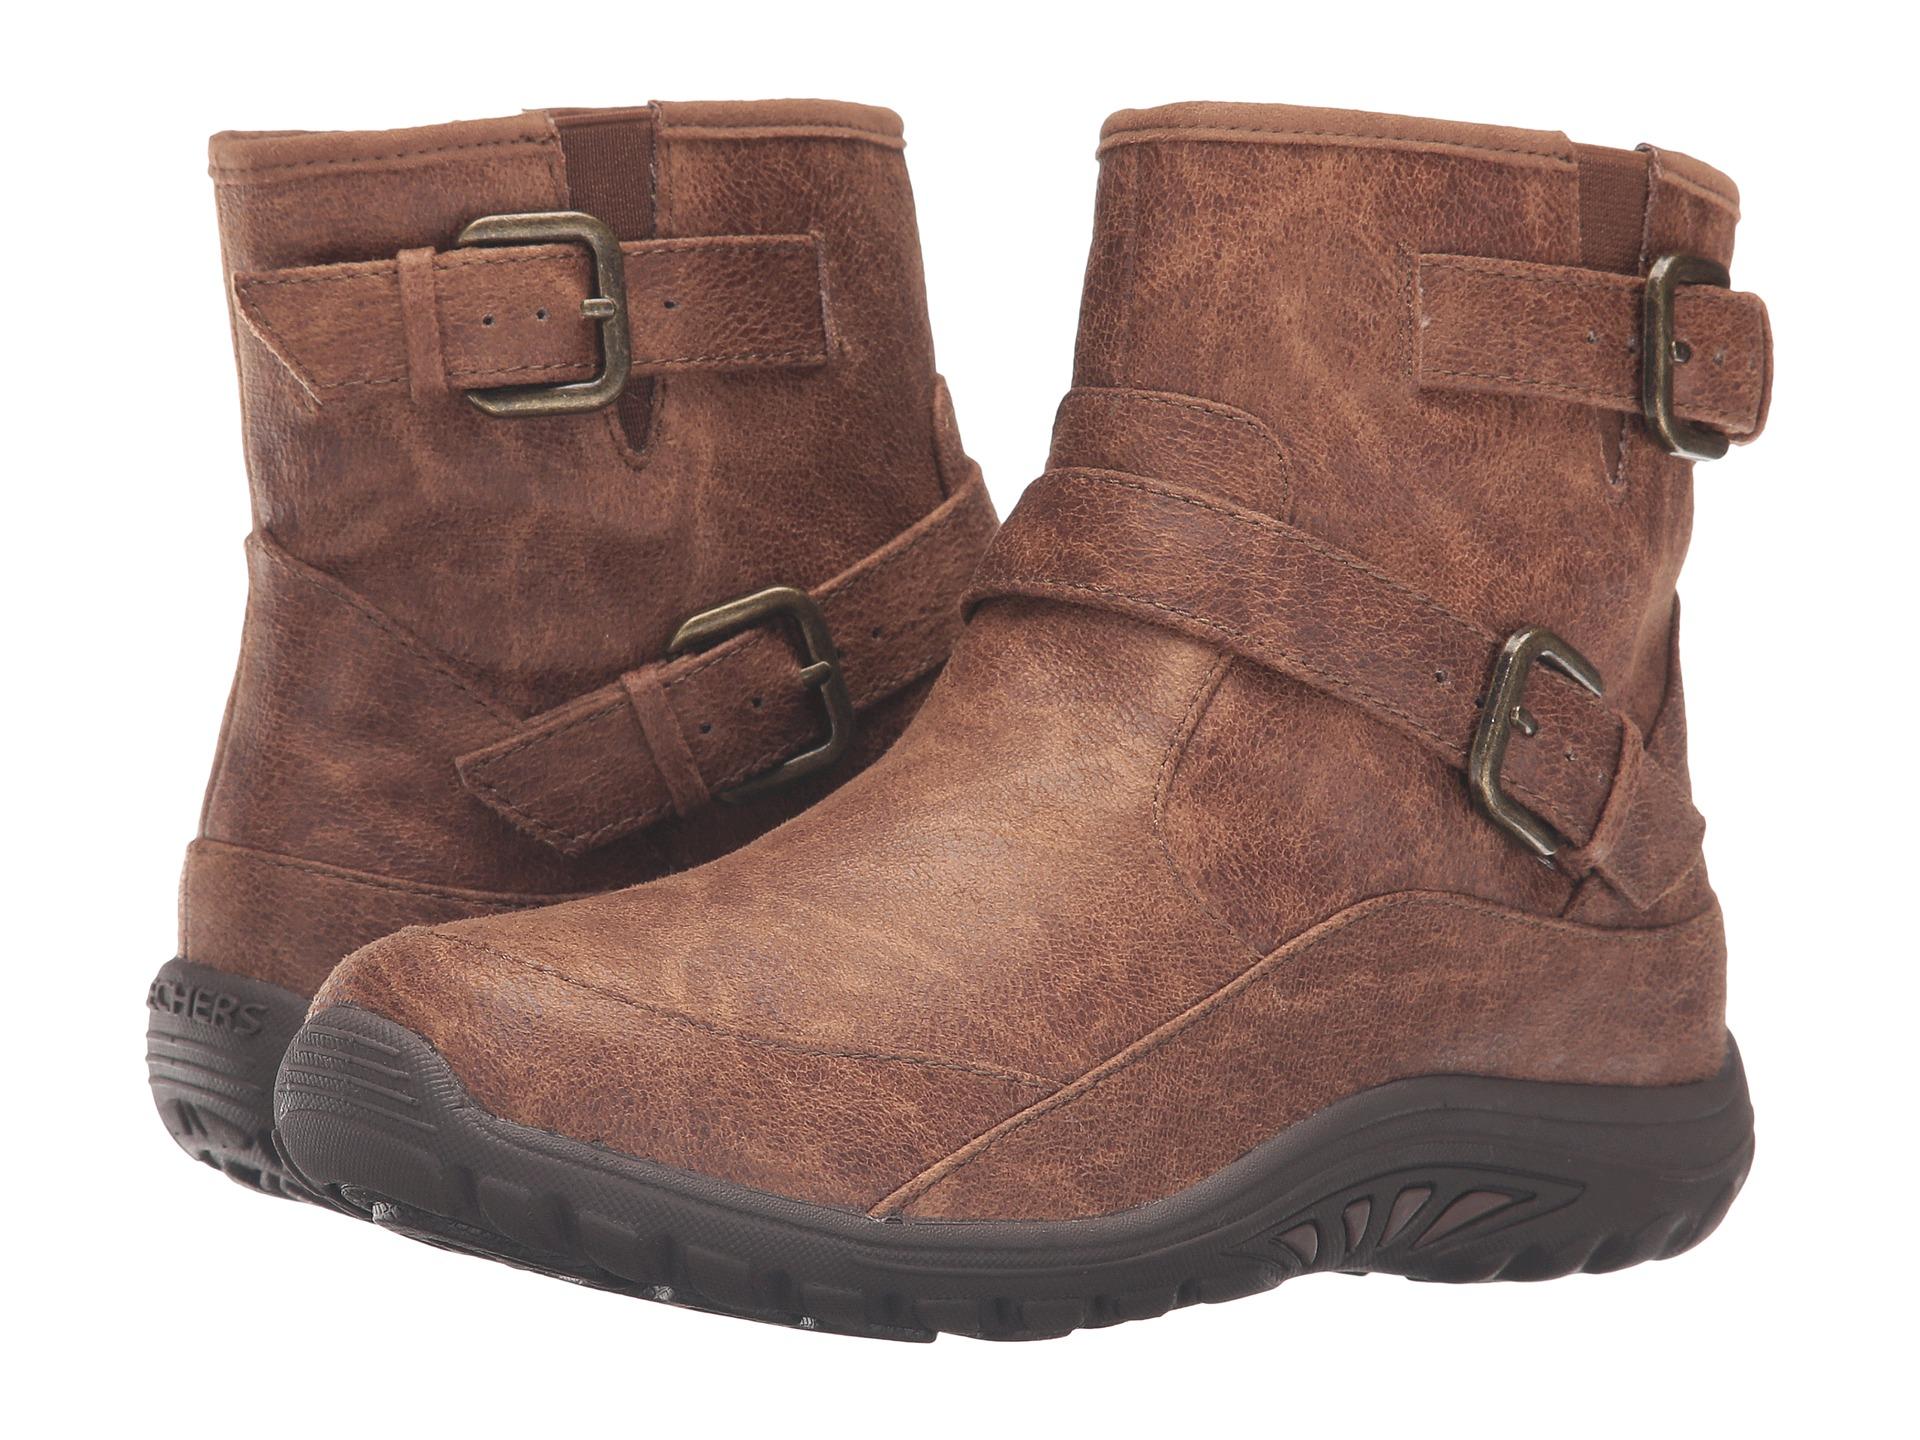 Buckle Boots For Men Images Saks Fifth Avenue Vidal